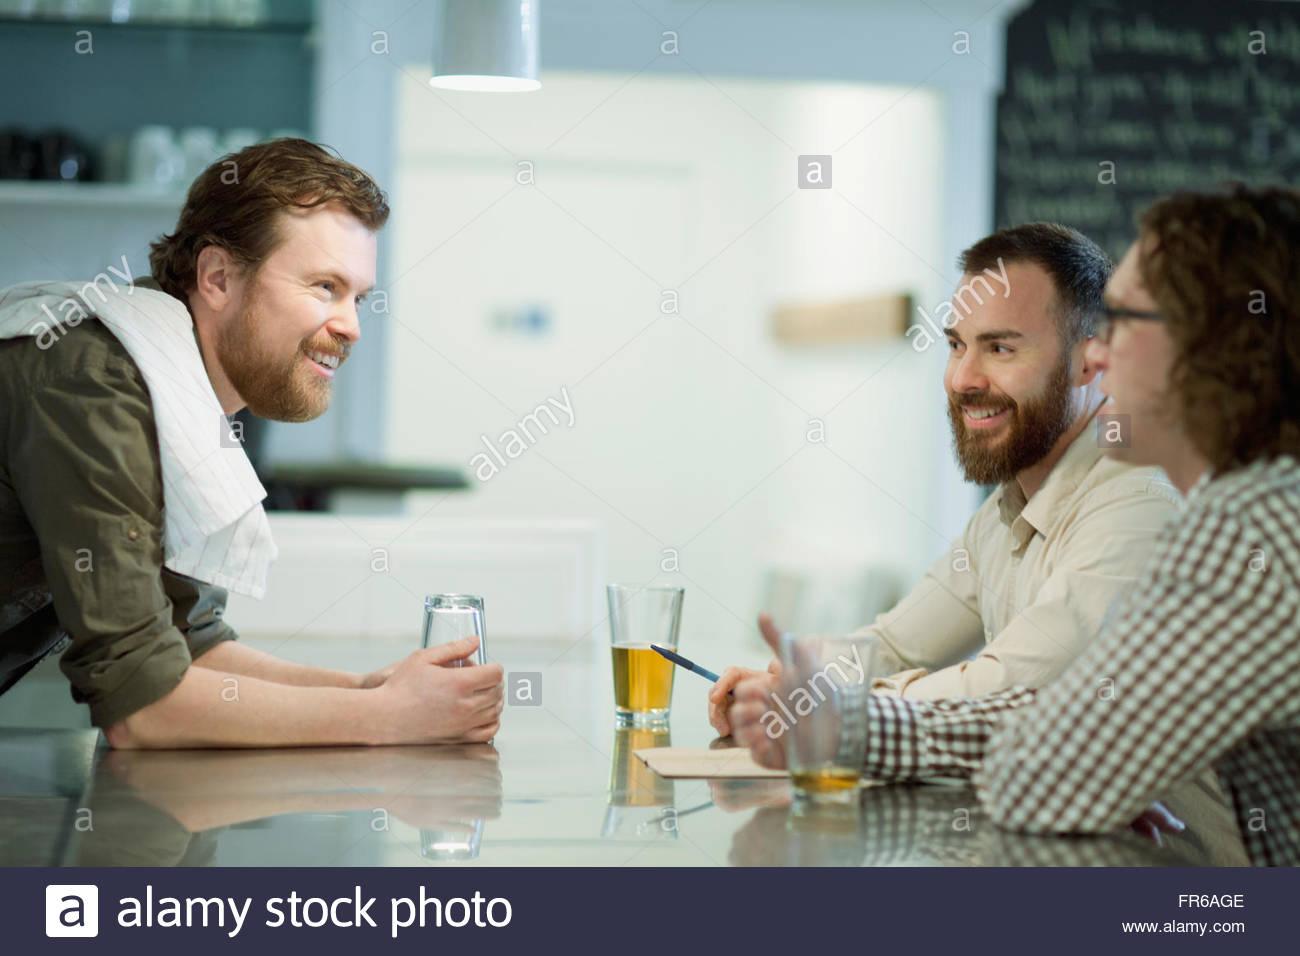 patrons enjoying drinks at diner - Stock Image